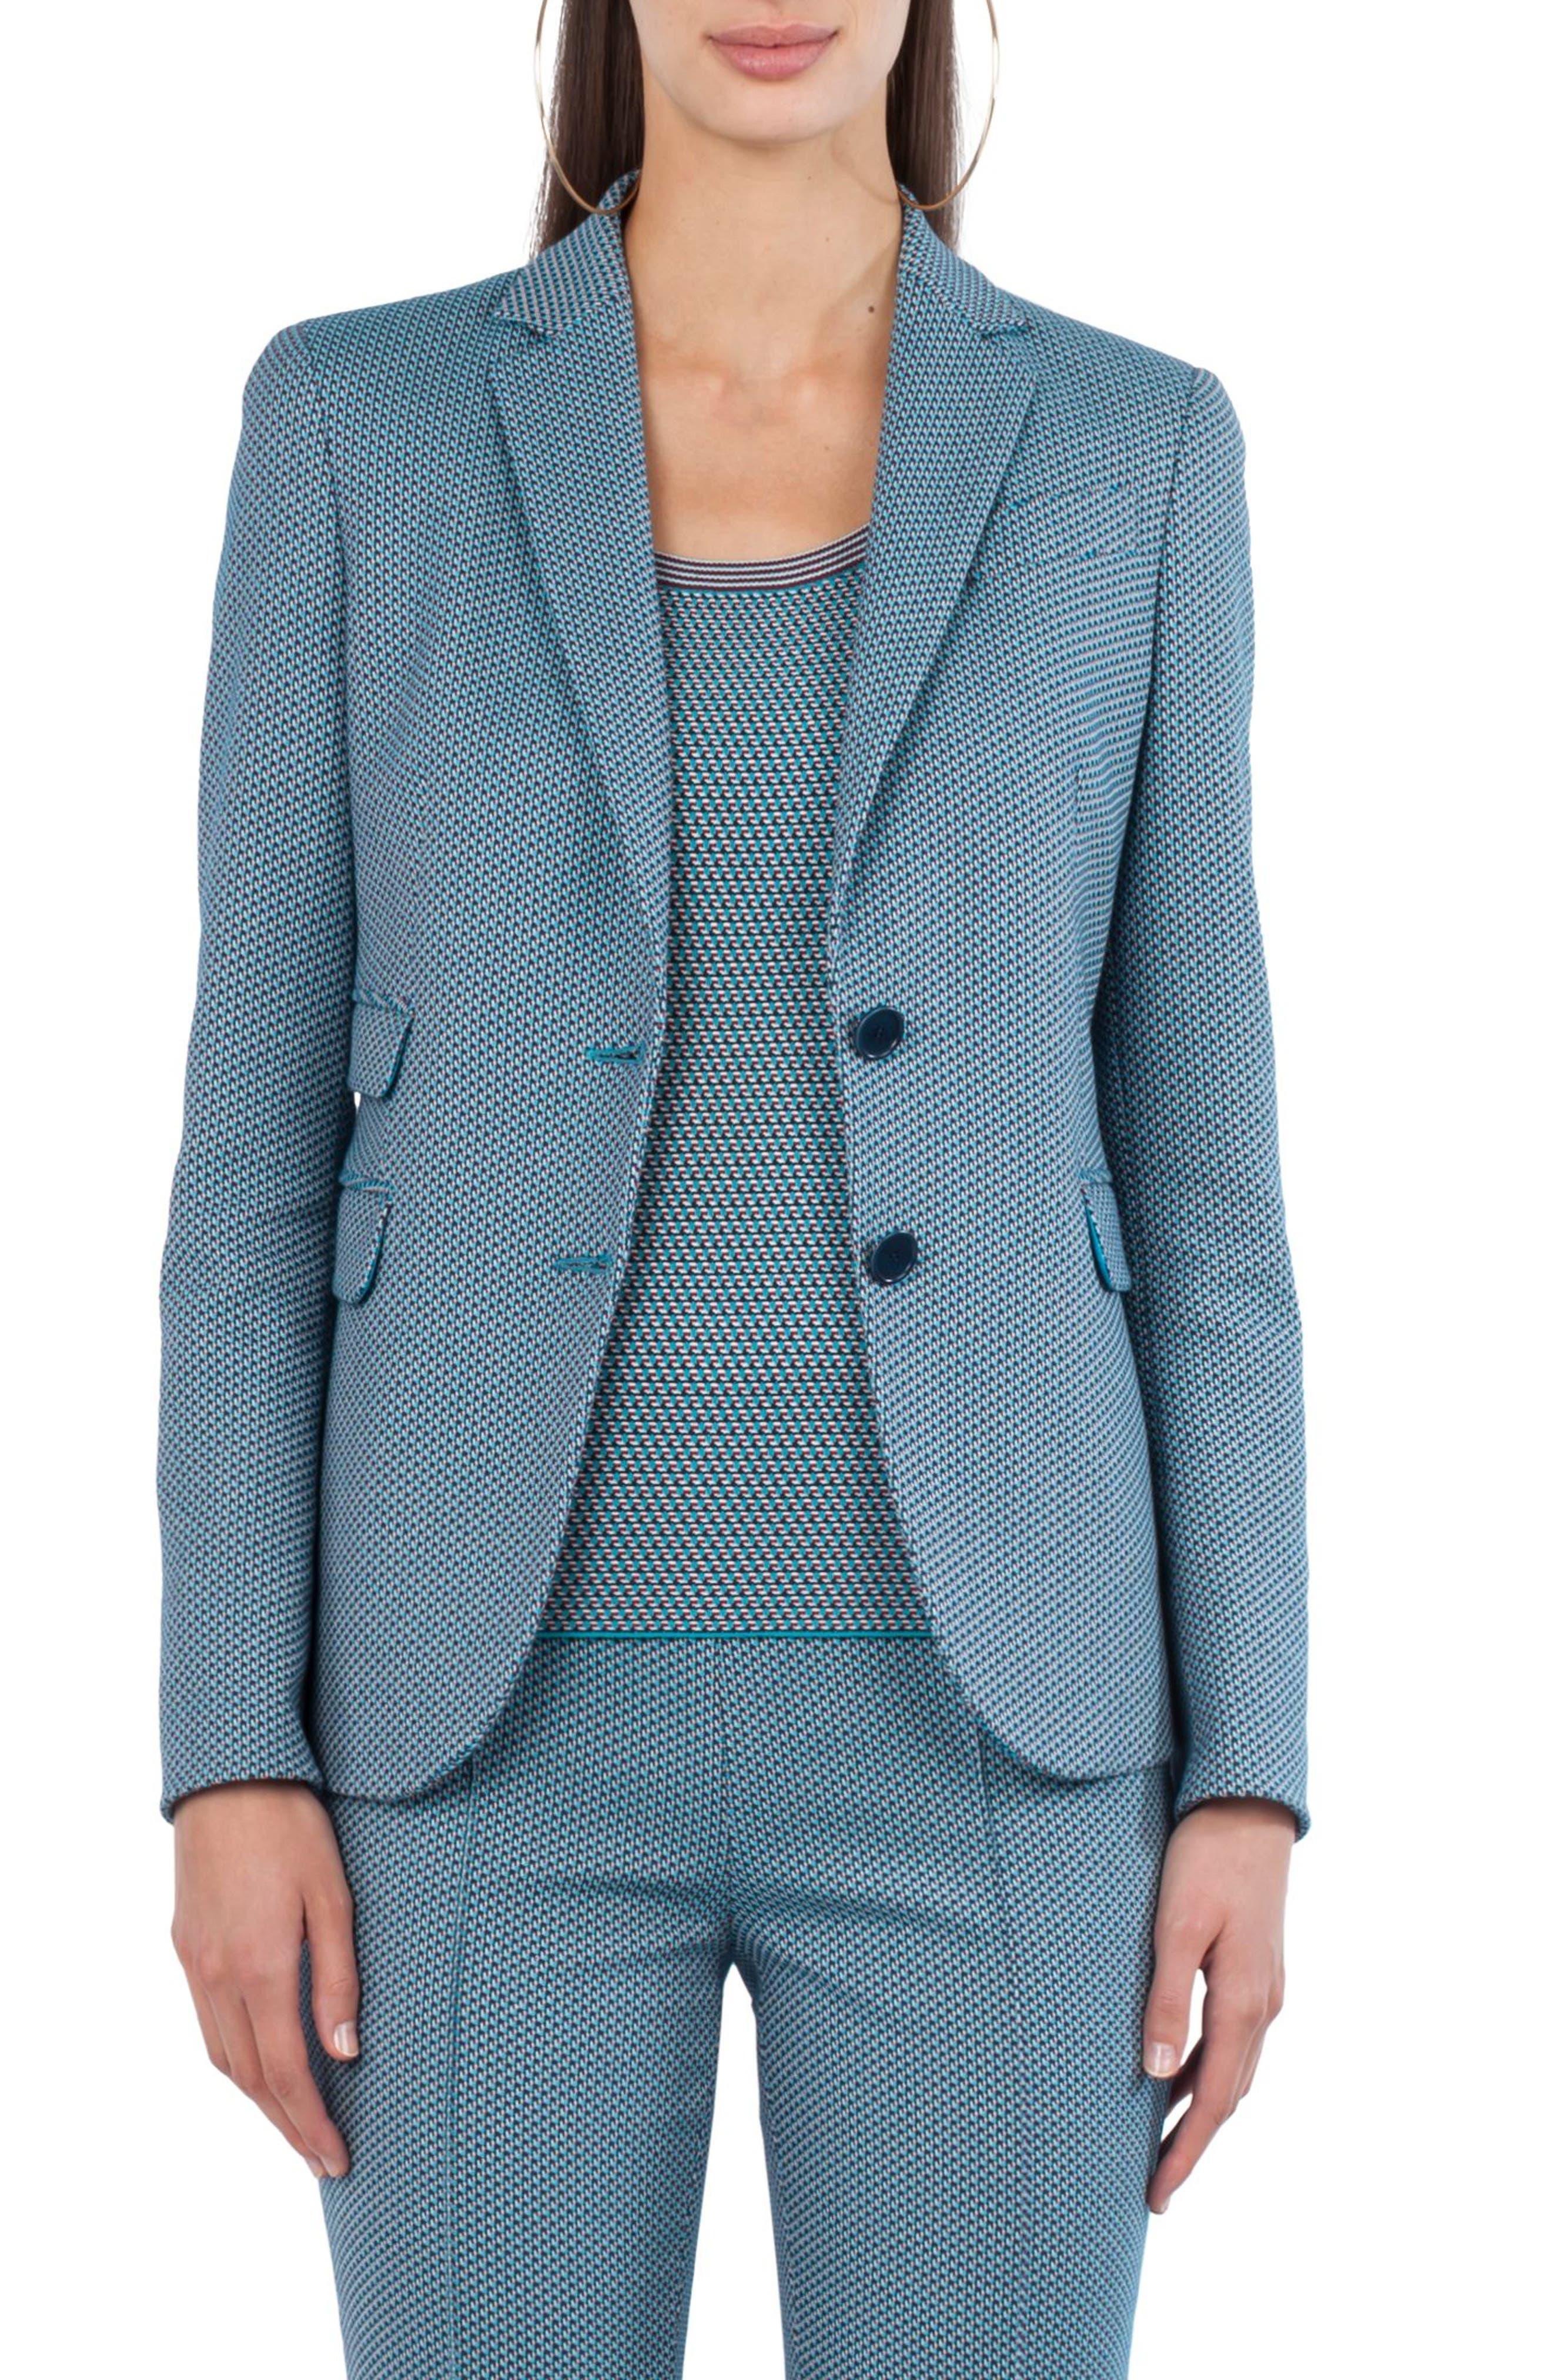 Fantasy Jacquard Knit Blazer,                         Main,                         color, Turquoise Multi